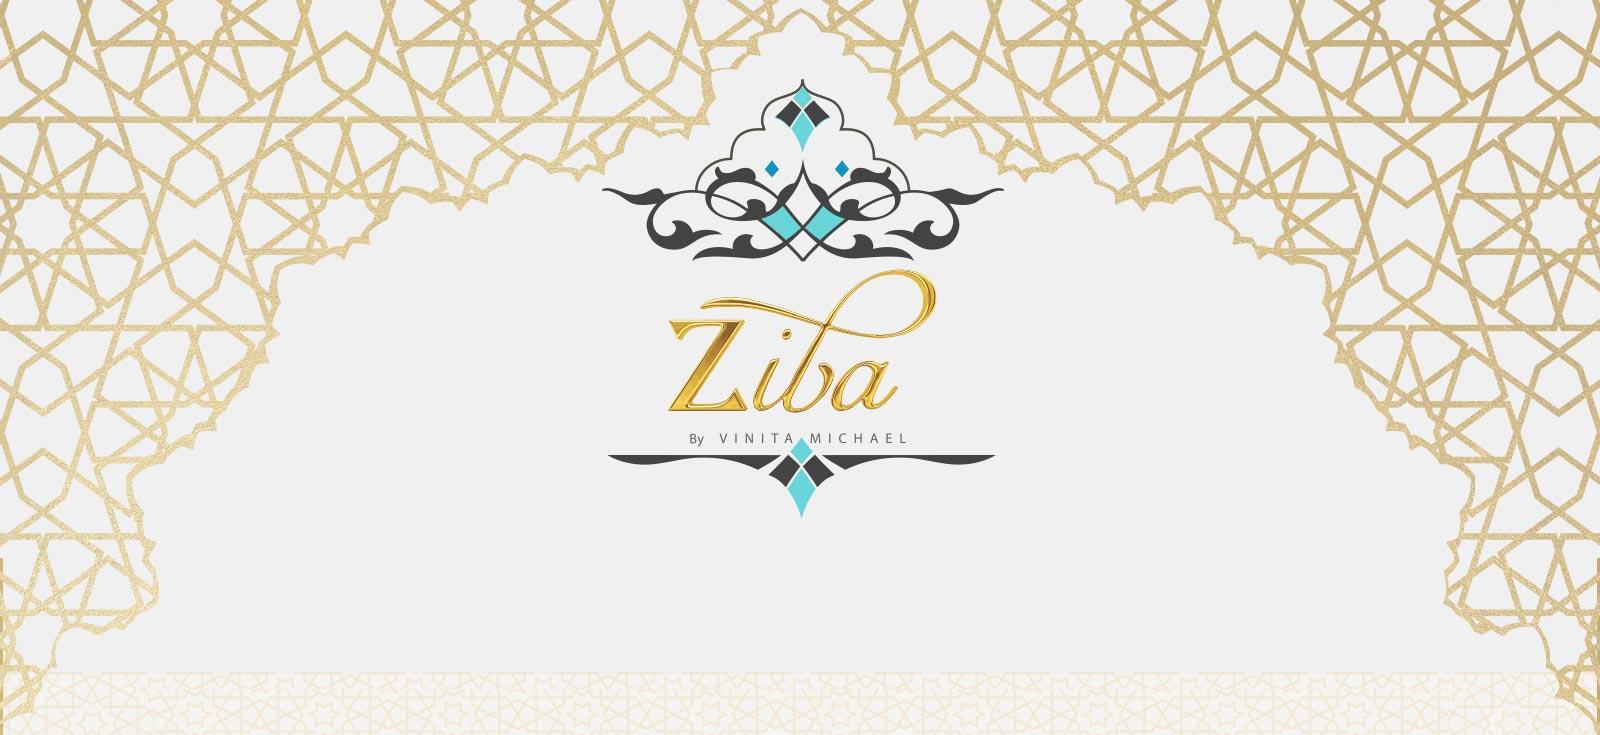 Ziba - by Vinita Michael